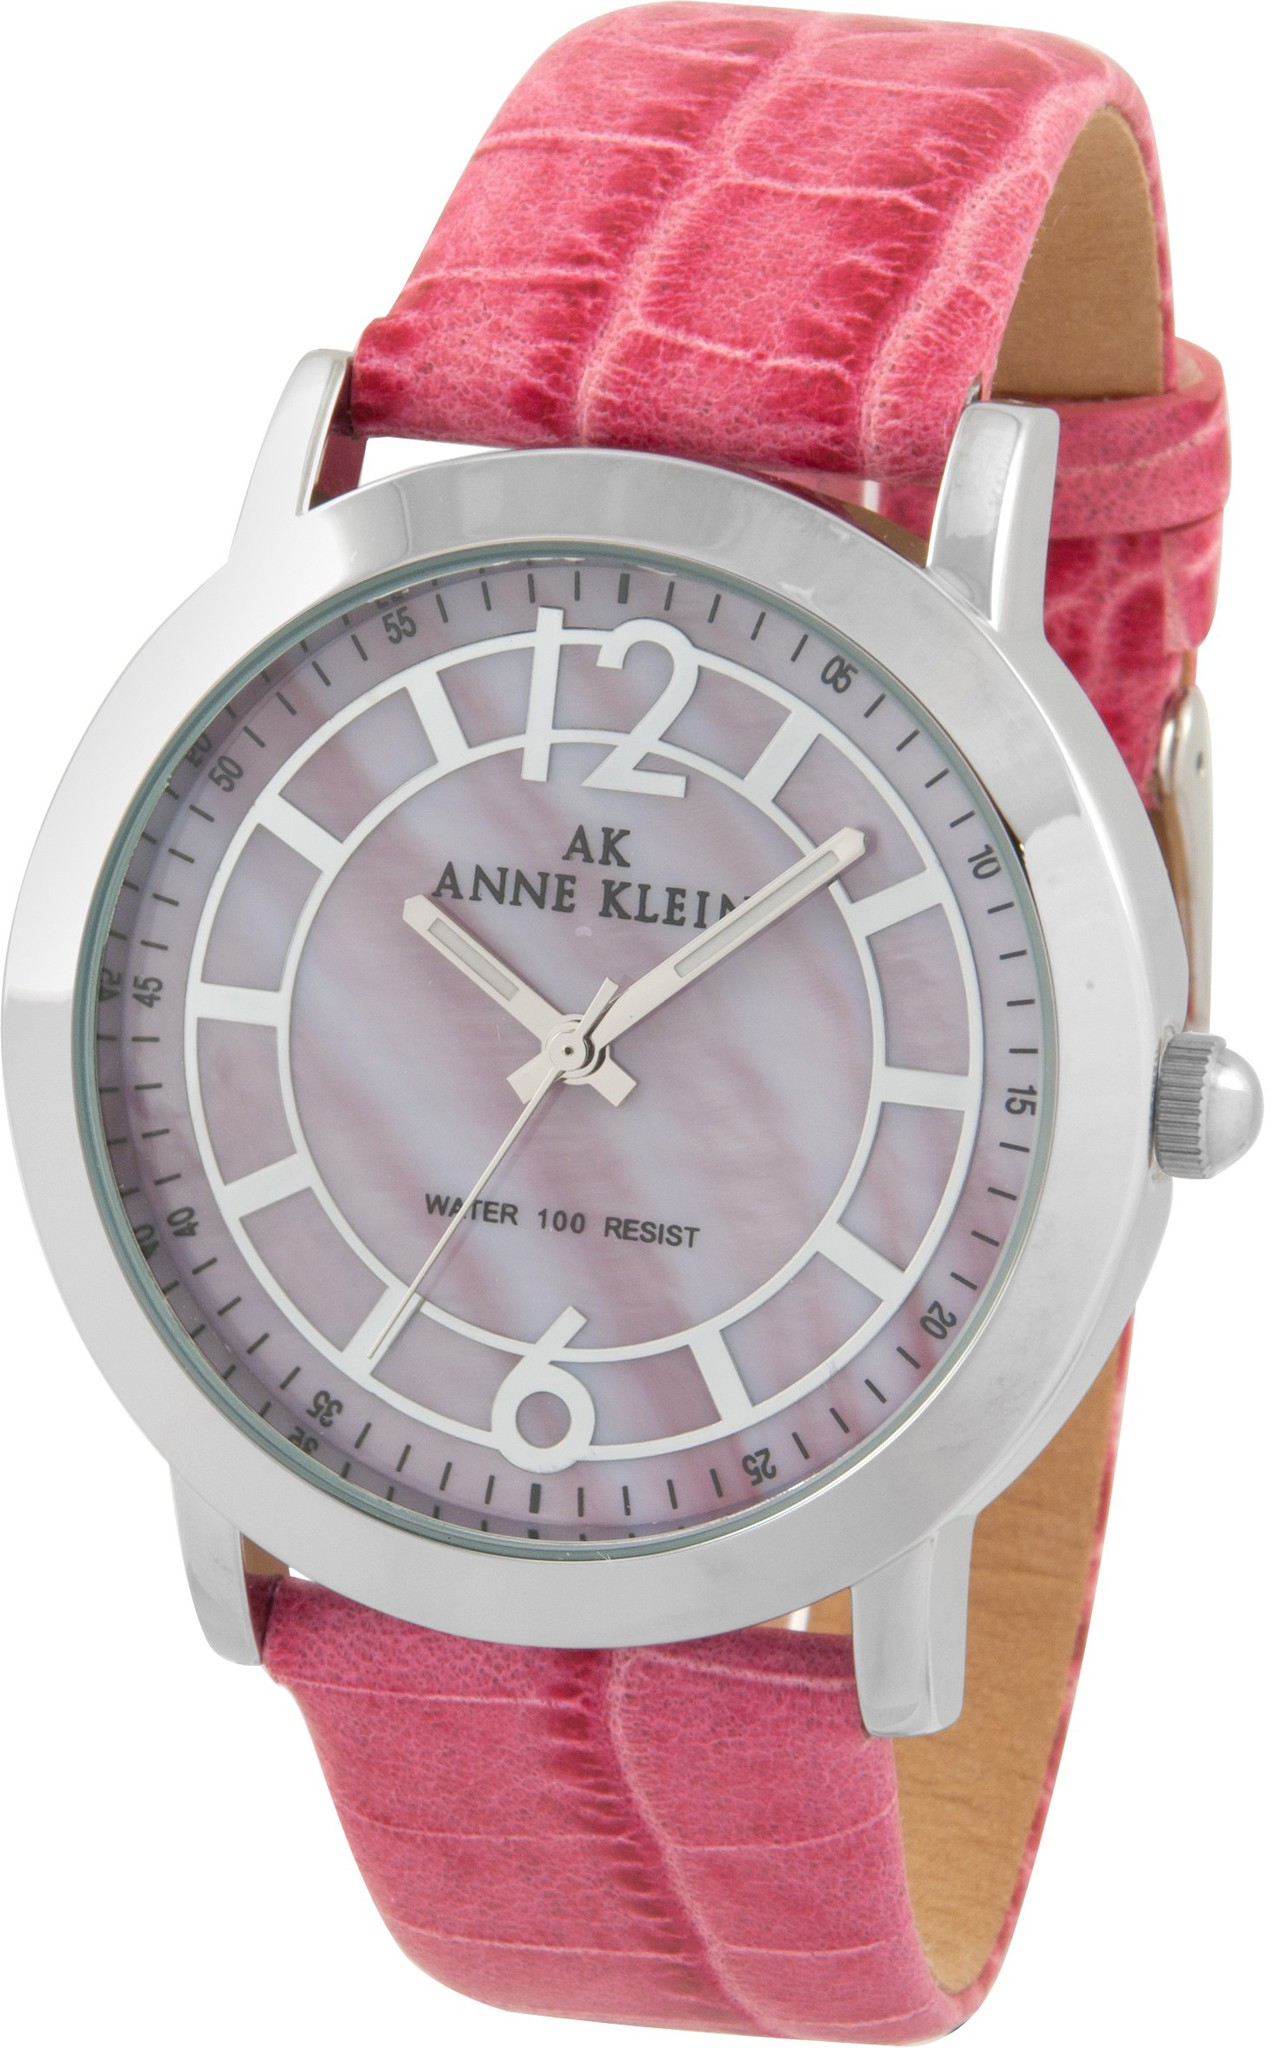 Anne Klein 9535PMPK - женские наручные часы из коллекции RainbowAnne Klein<br><br><br>Бренд: Anne Klein<br>Модель: Anne Klein 9535 PMPK<br>Артикул: 9535PMPK<br>Вариант артикула: None<br>Коллекция: Rainbow<br>Подколлекция: None<br>Страна: США<br>Пол: женские<br>Тип механизма: кварцевые<br>Механизм: None<br>Количество камней: None<br>Автоподзавод: None<br>Источник энергии: от батарейки<br>Срок службы элемента питания: None<br>Дисплей: стрелки<br>Цифры: арабские<br>Водозащита: WR 30<br>Противоударные: None<br>Материал корпуса: нерж. сталь<br>Материал браслета: кожа<br>Материал безеля: None<br>Стекло: минеральное<br>Антибликовое покрытие: None<br>Цвет корпуса: None<br>Цвет браслета: None<br>Цвет циферблата: None<br>Цвет безеля: None<br>Размеры: None<br>Диаметр: None<br>Диаметр корпуса: None<br>Толщина: None<br>Ширина ремешка: None<br>Вес: None<br>Спорт-функции: None<br>Подсветка: стрелок<br>Вставка: None<br>Отображение даты: None<br>Хронограф: None<br>Таймер: None<br>Термометр: None<br>Хронометр: None<br>GPS: None<br>Радиосинхронизация: None<br>Барометр: None<br>Скелетон: None<br>Дополнительная информация: None<br>Дополнительные функции: None